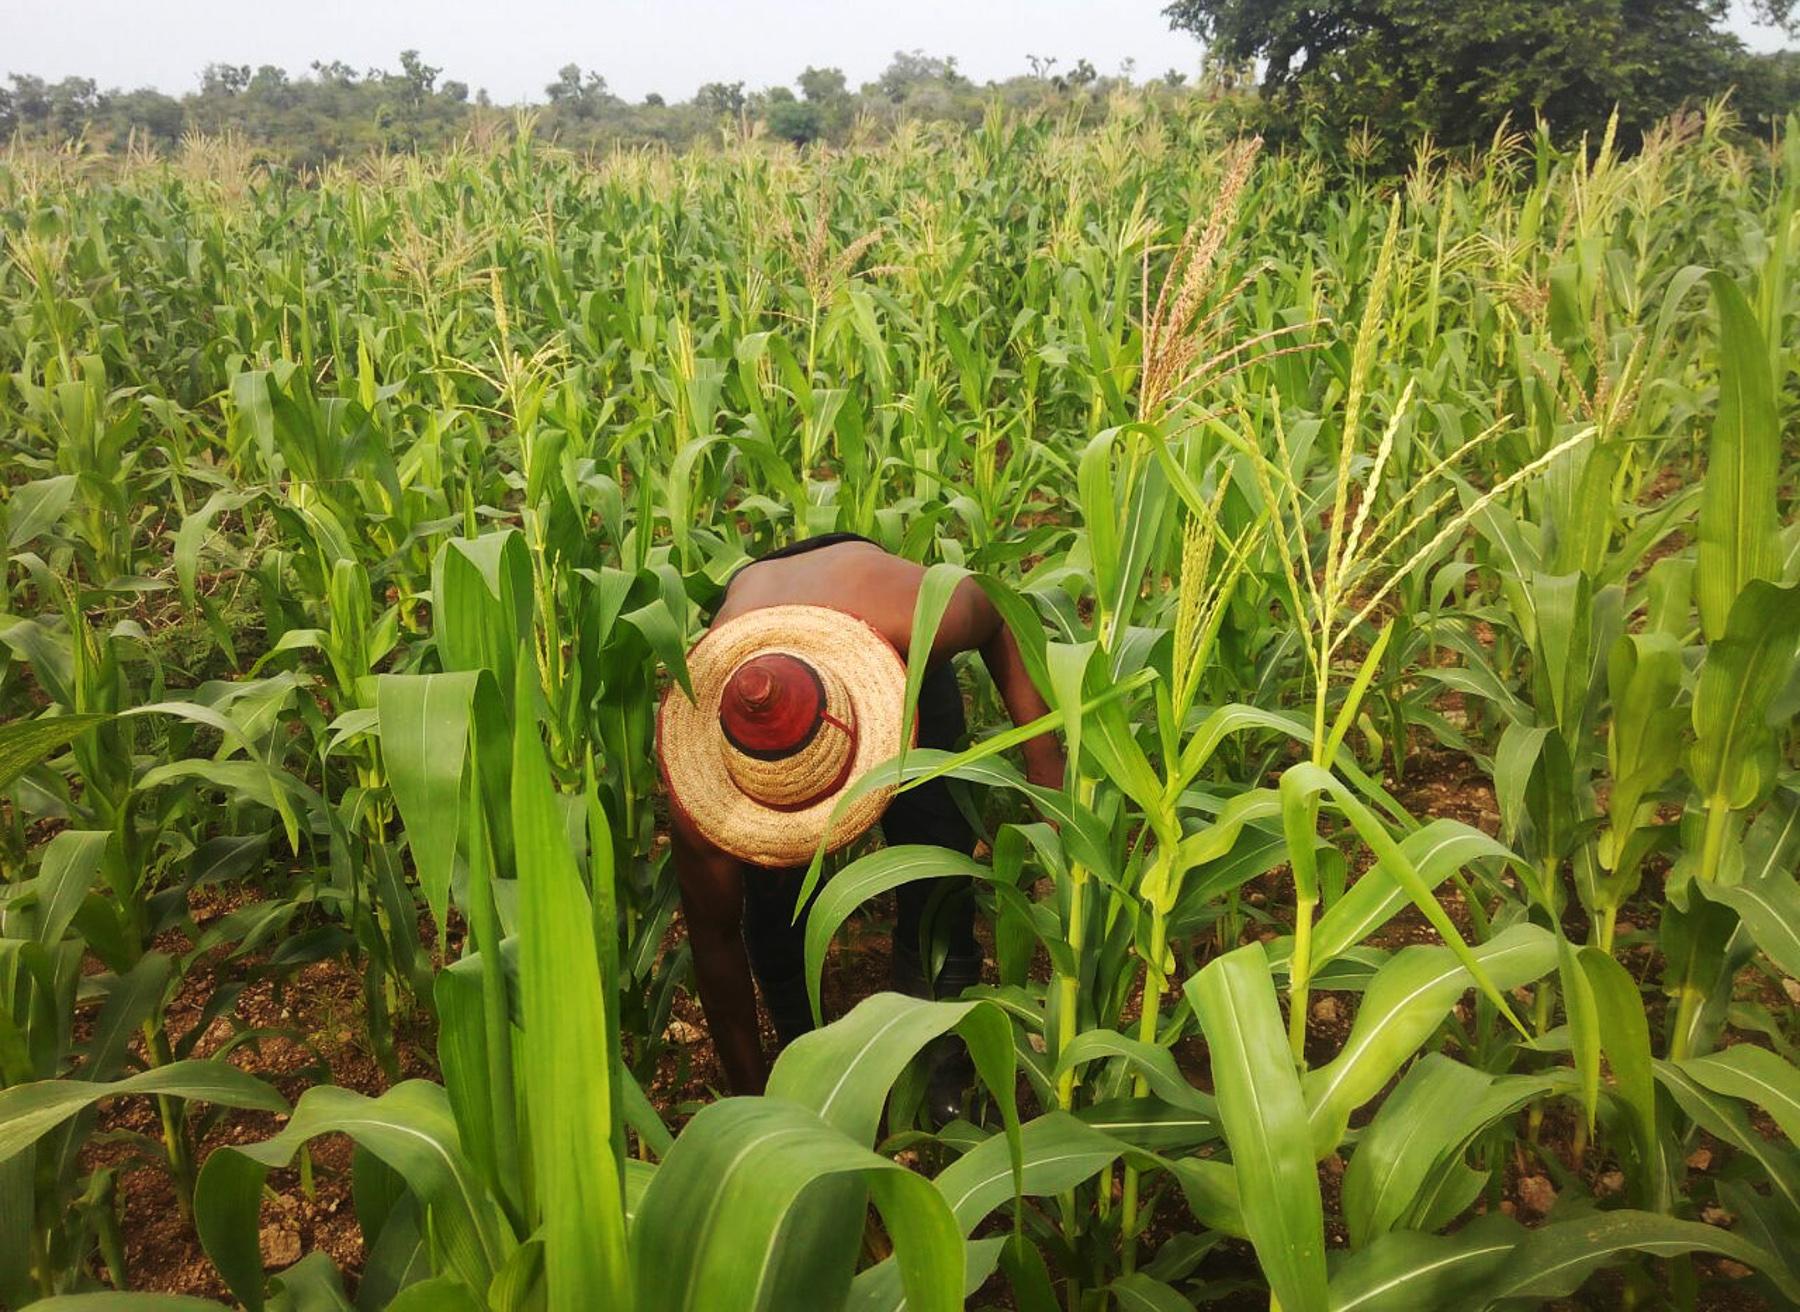 Farmer in straw hat tending to cornfield (AUN-API)